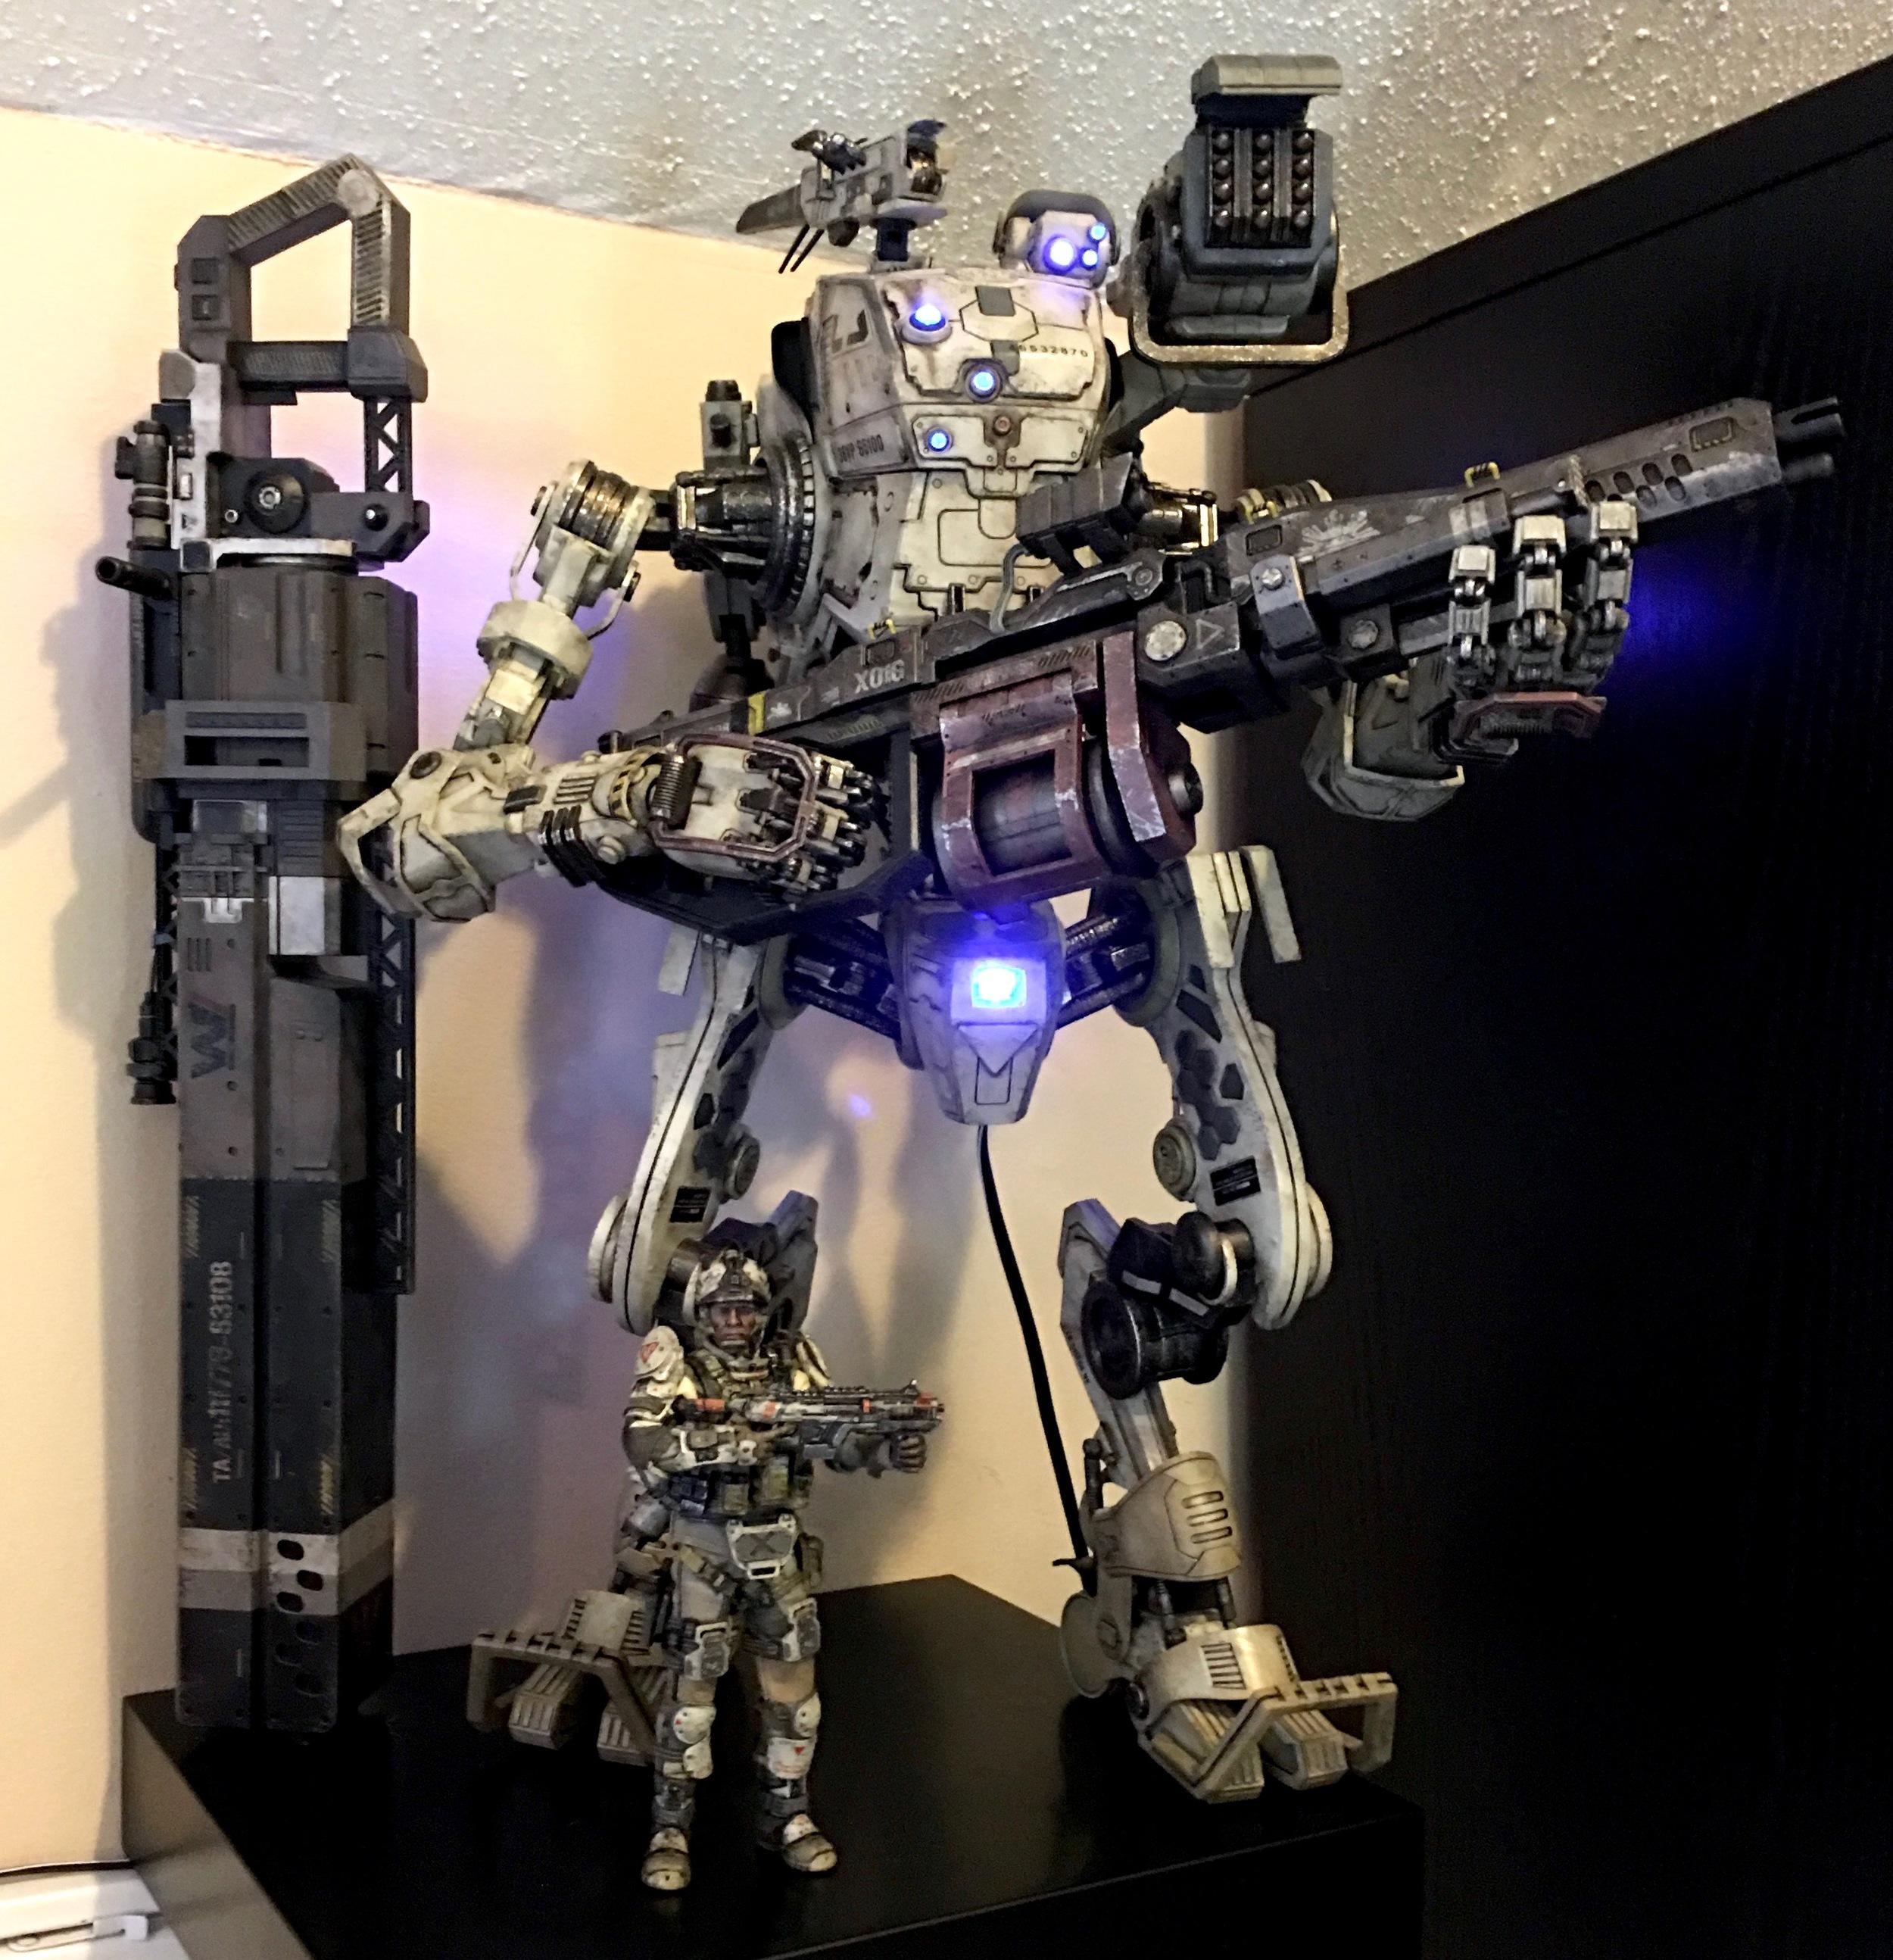 Titanfall  Stryder titan with CQB pilot, chain gun, rail gun and hard-wired LED lighting.